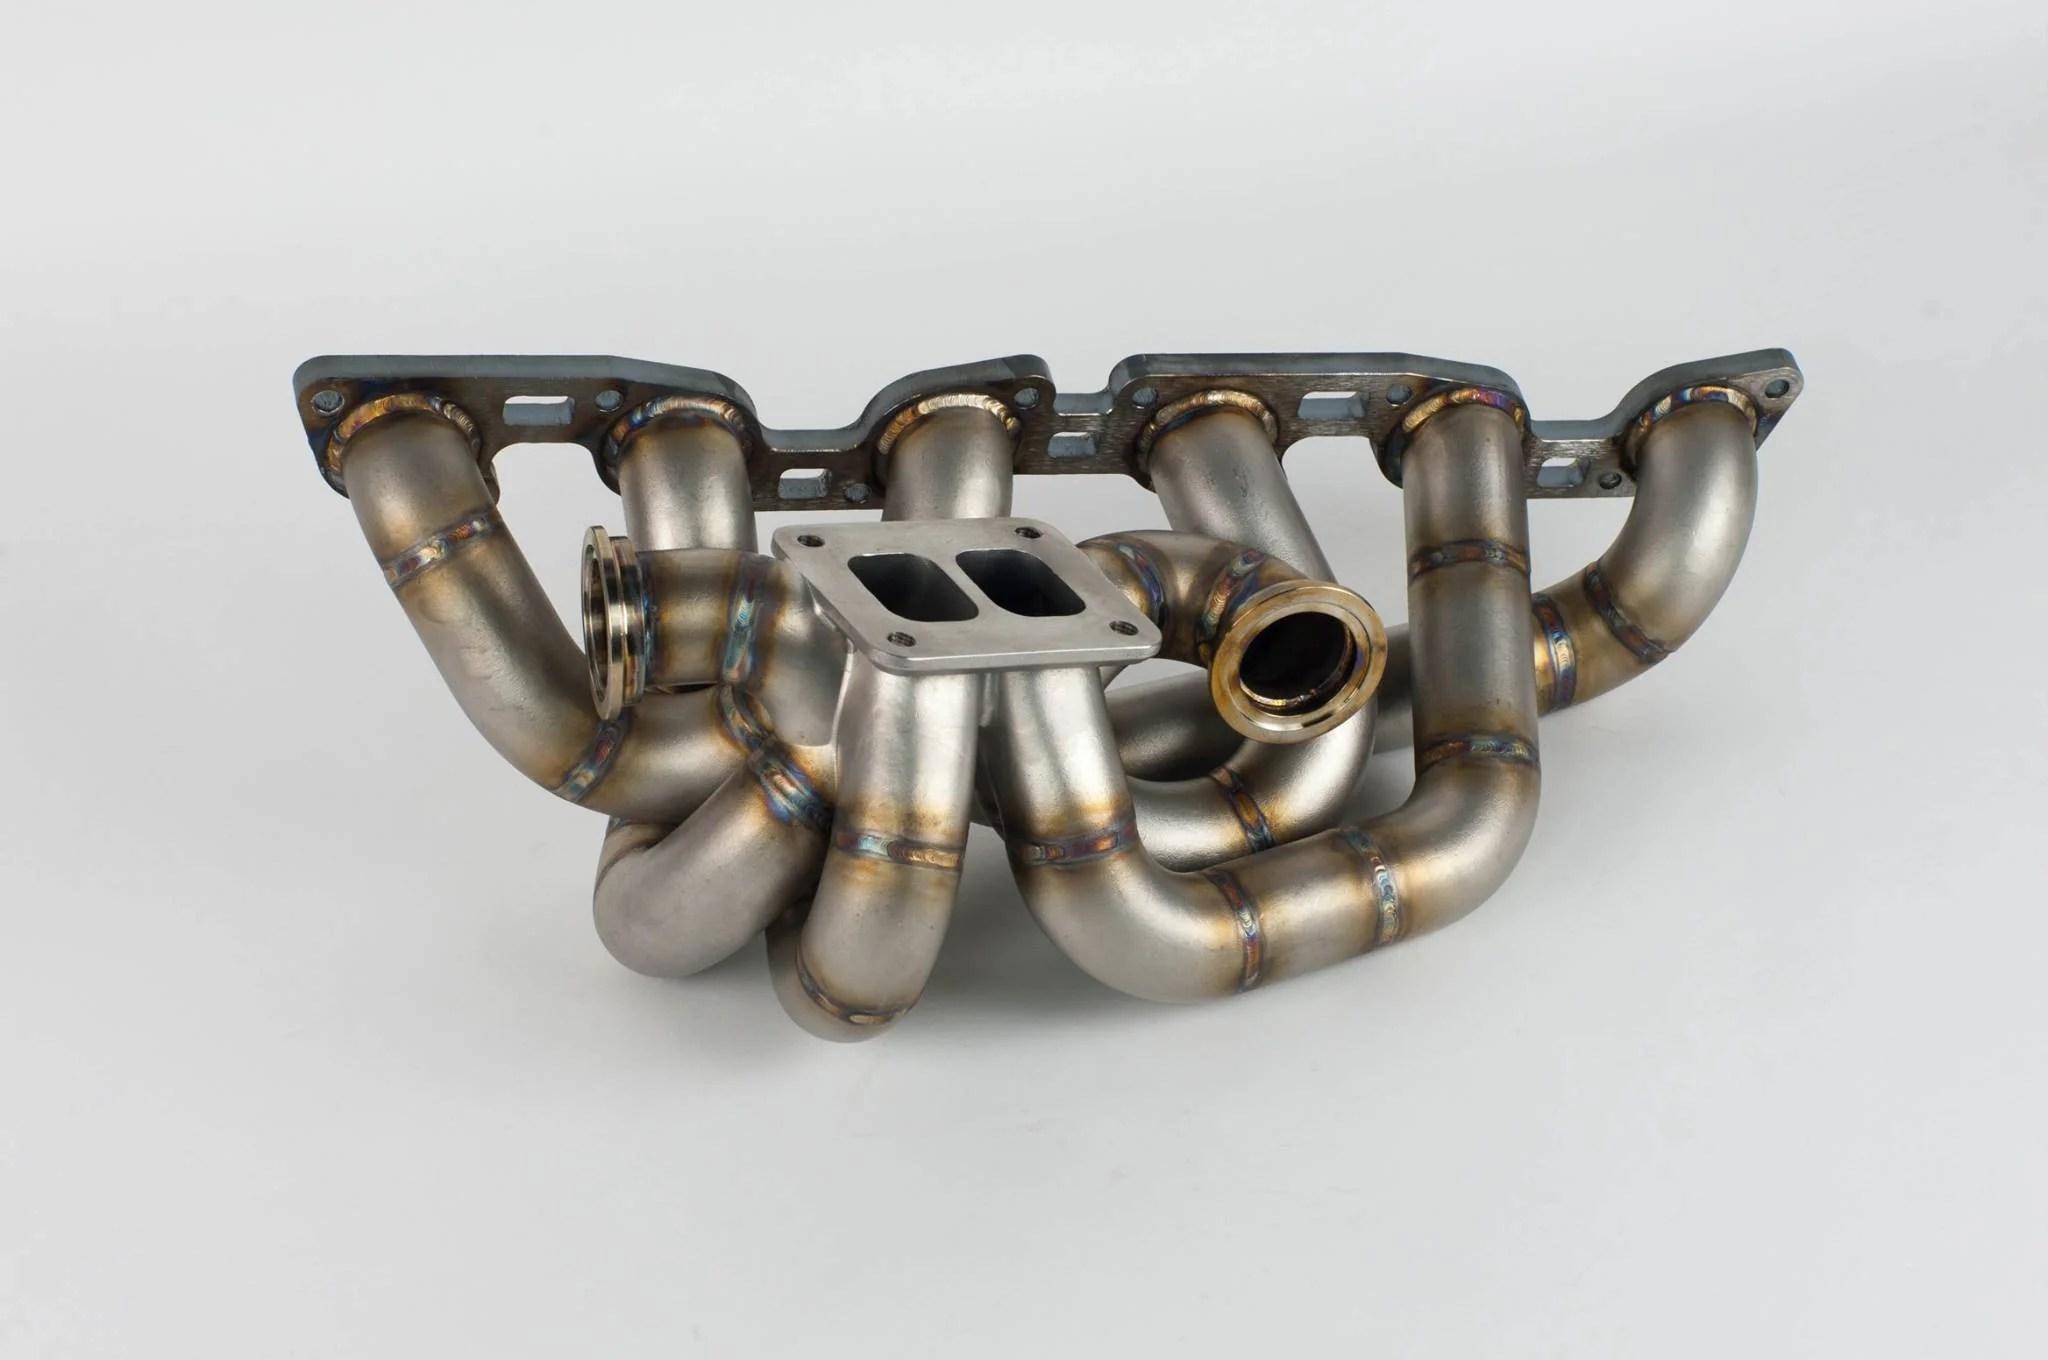 medium resolution of twin turbo exhaust manifold